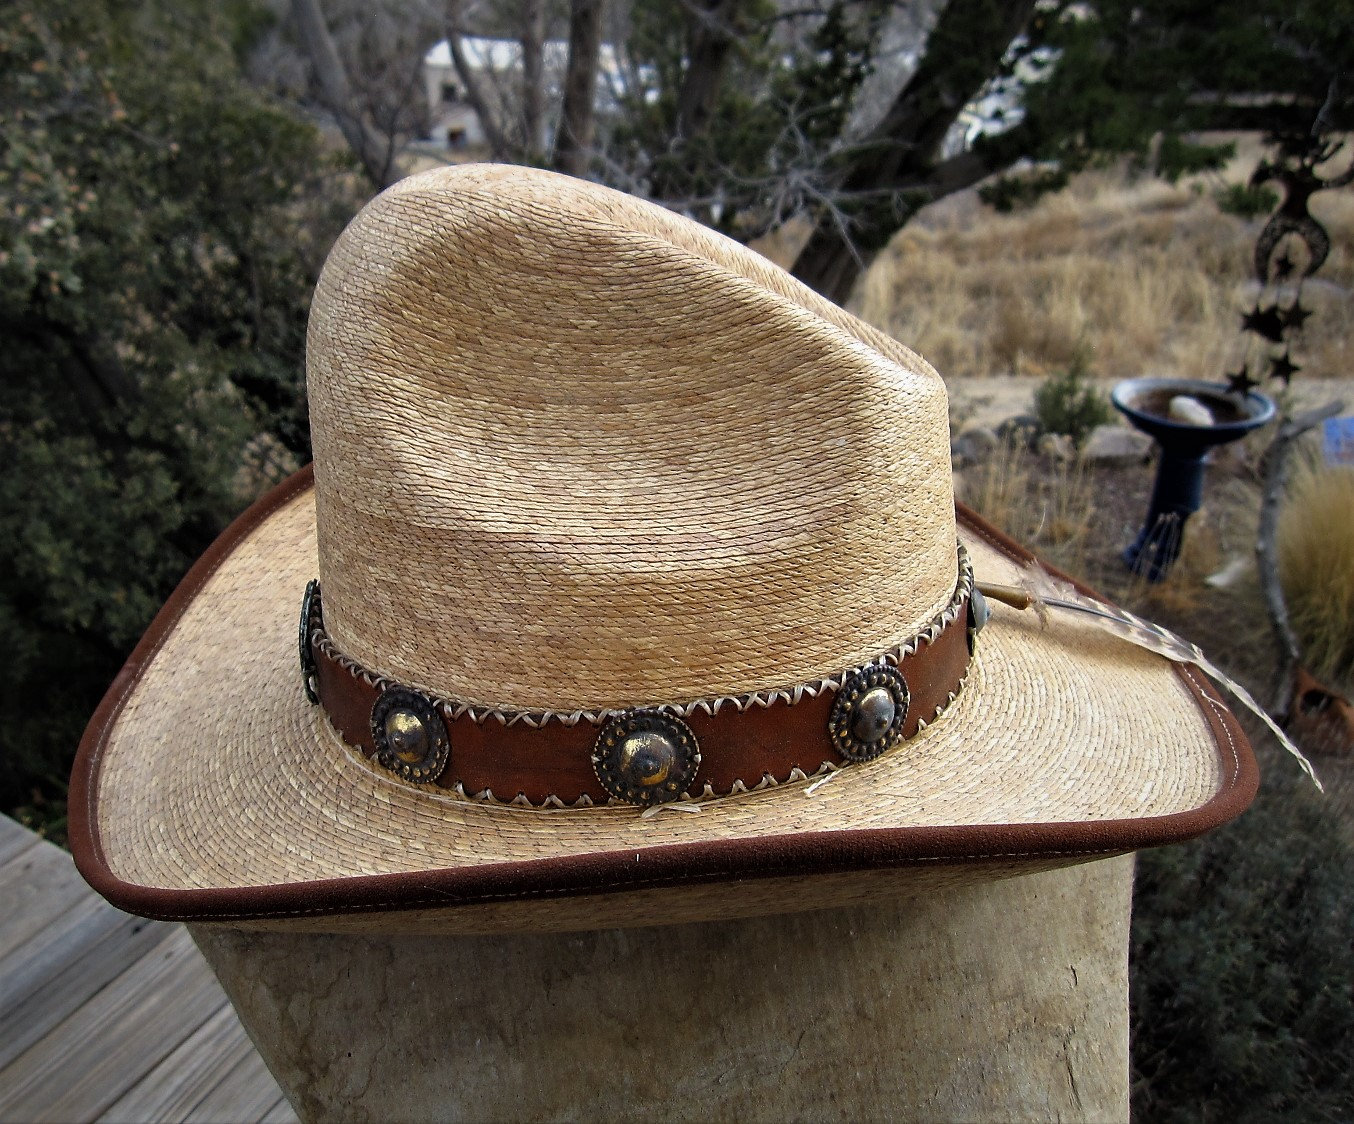 Viva Mexico Vintage Straw Hat